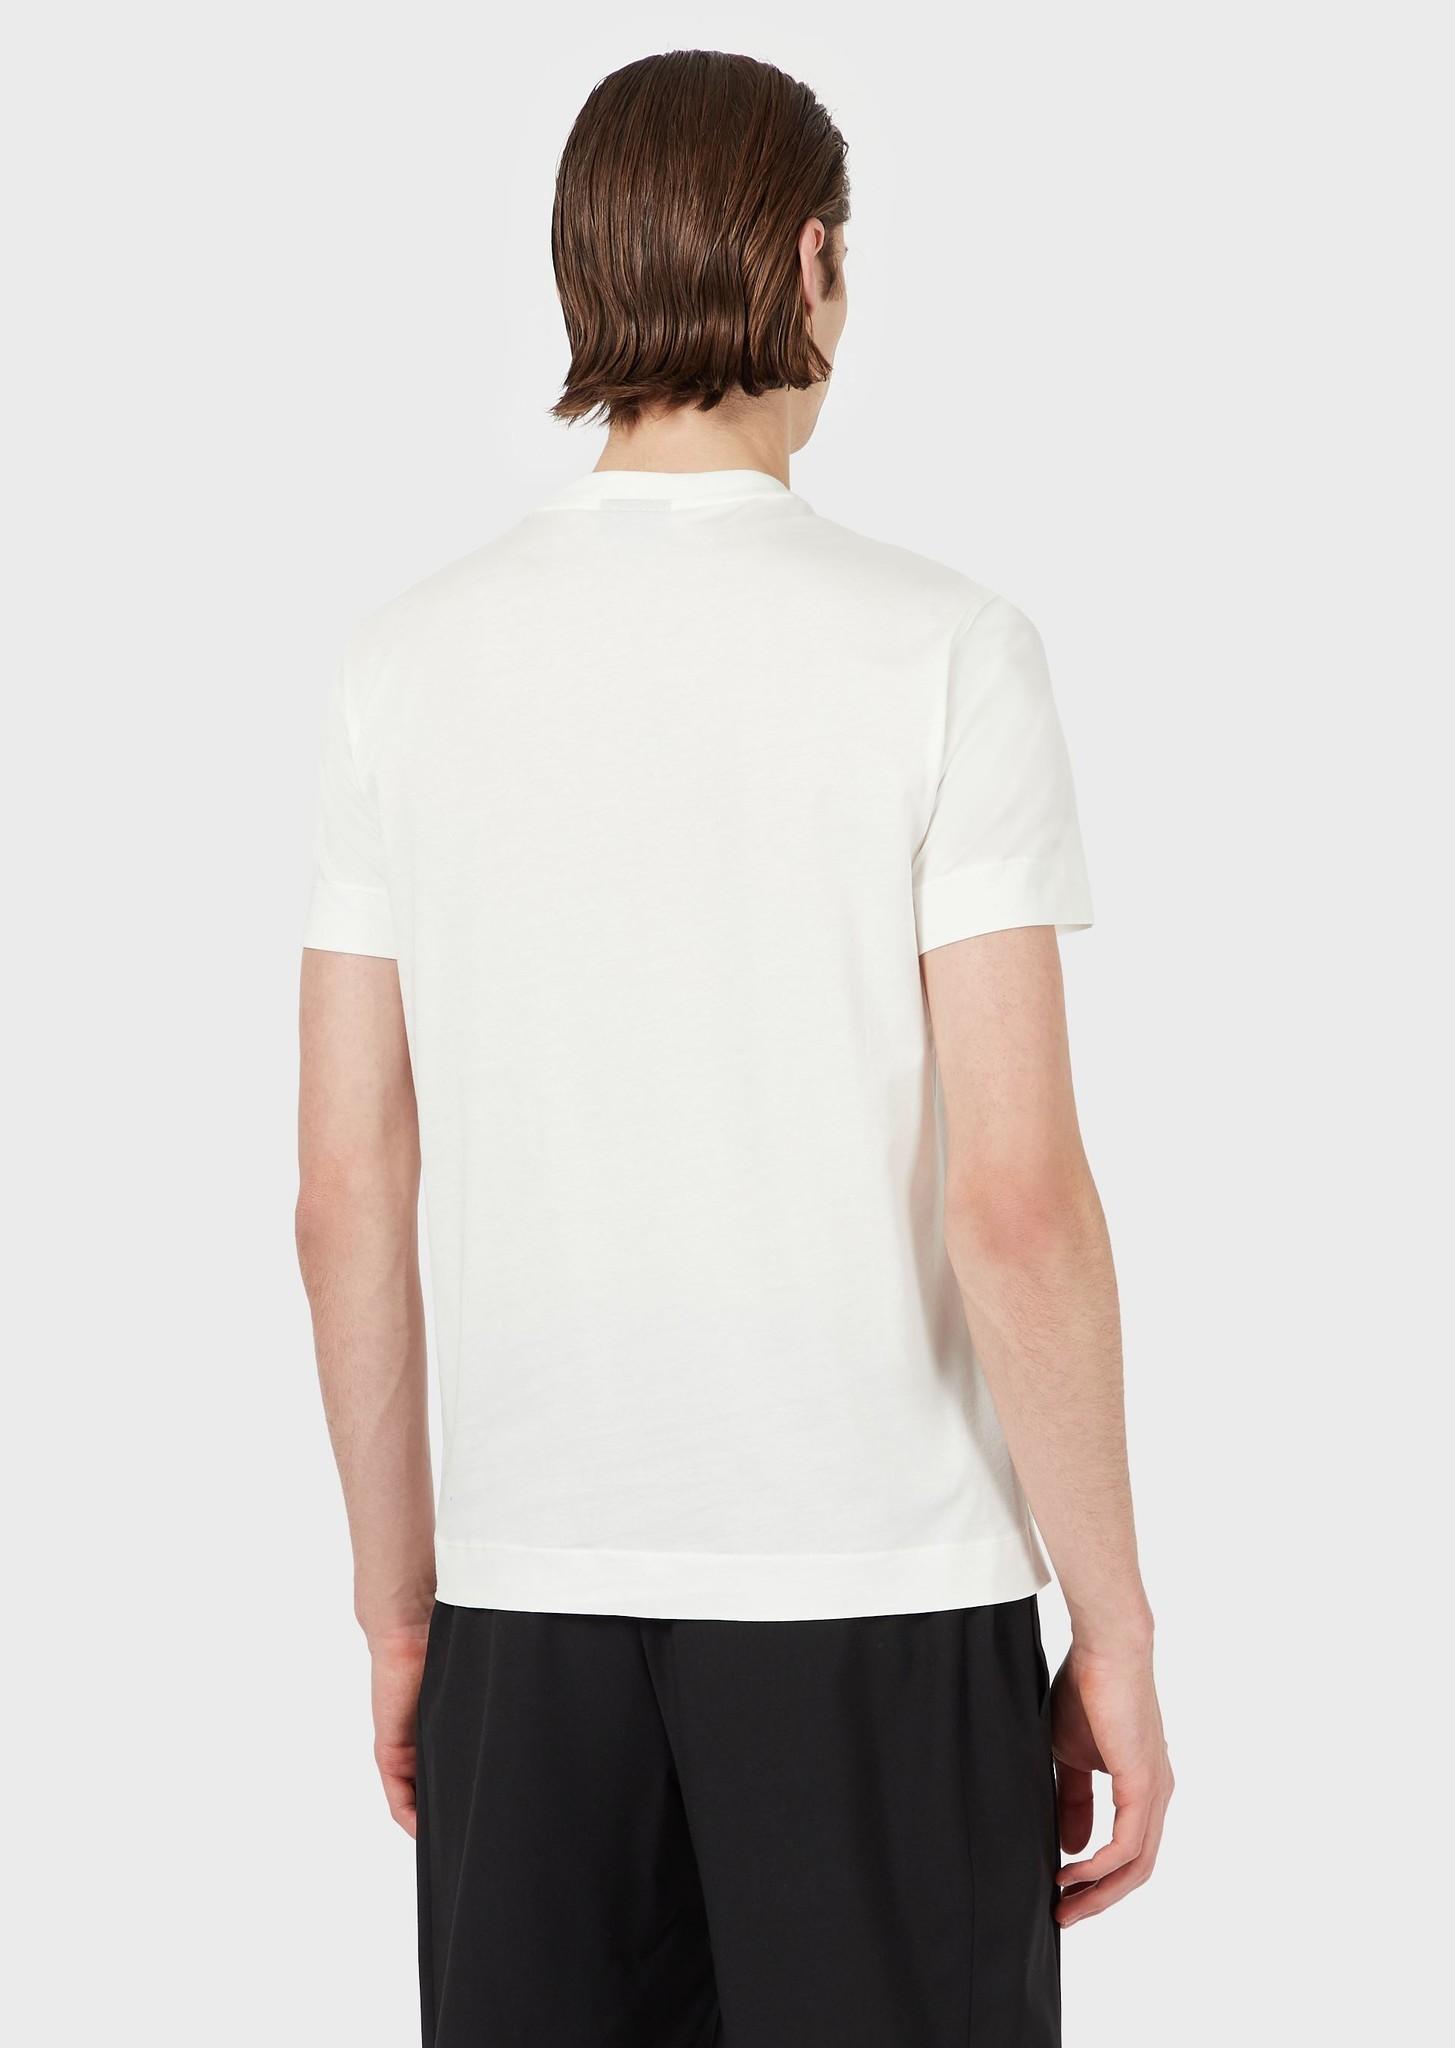 Emporio Armani T-shirt Emporio Armani 3K1TM5-1JDXZ-0101